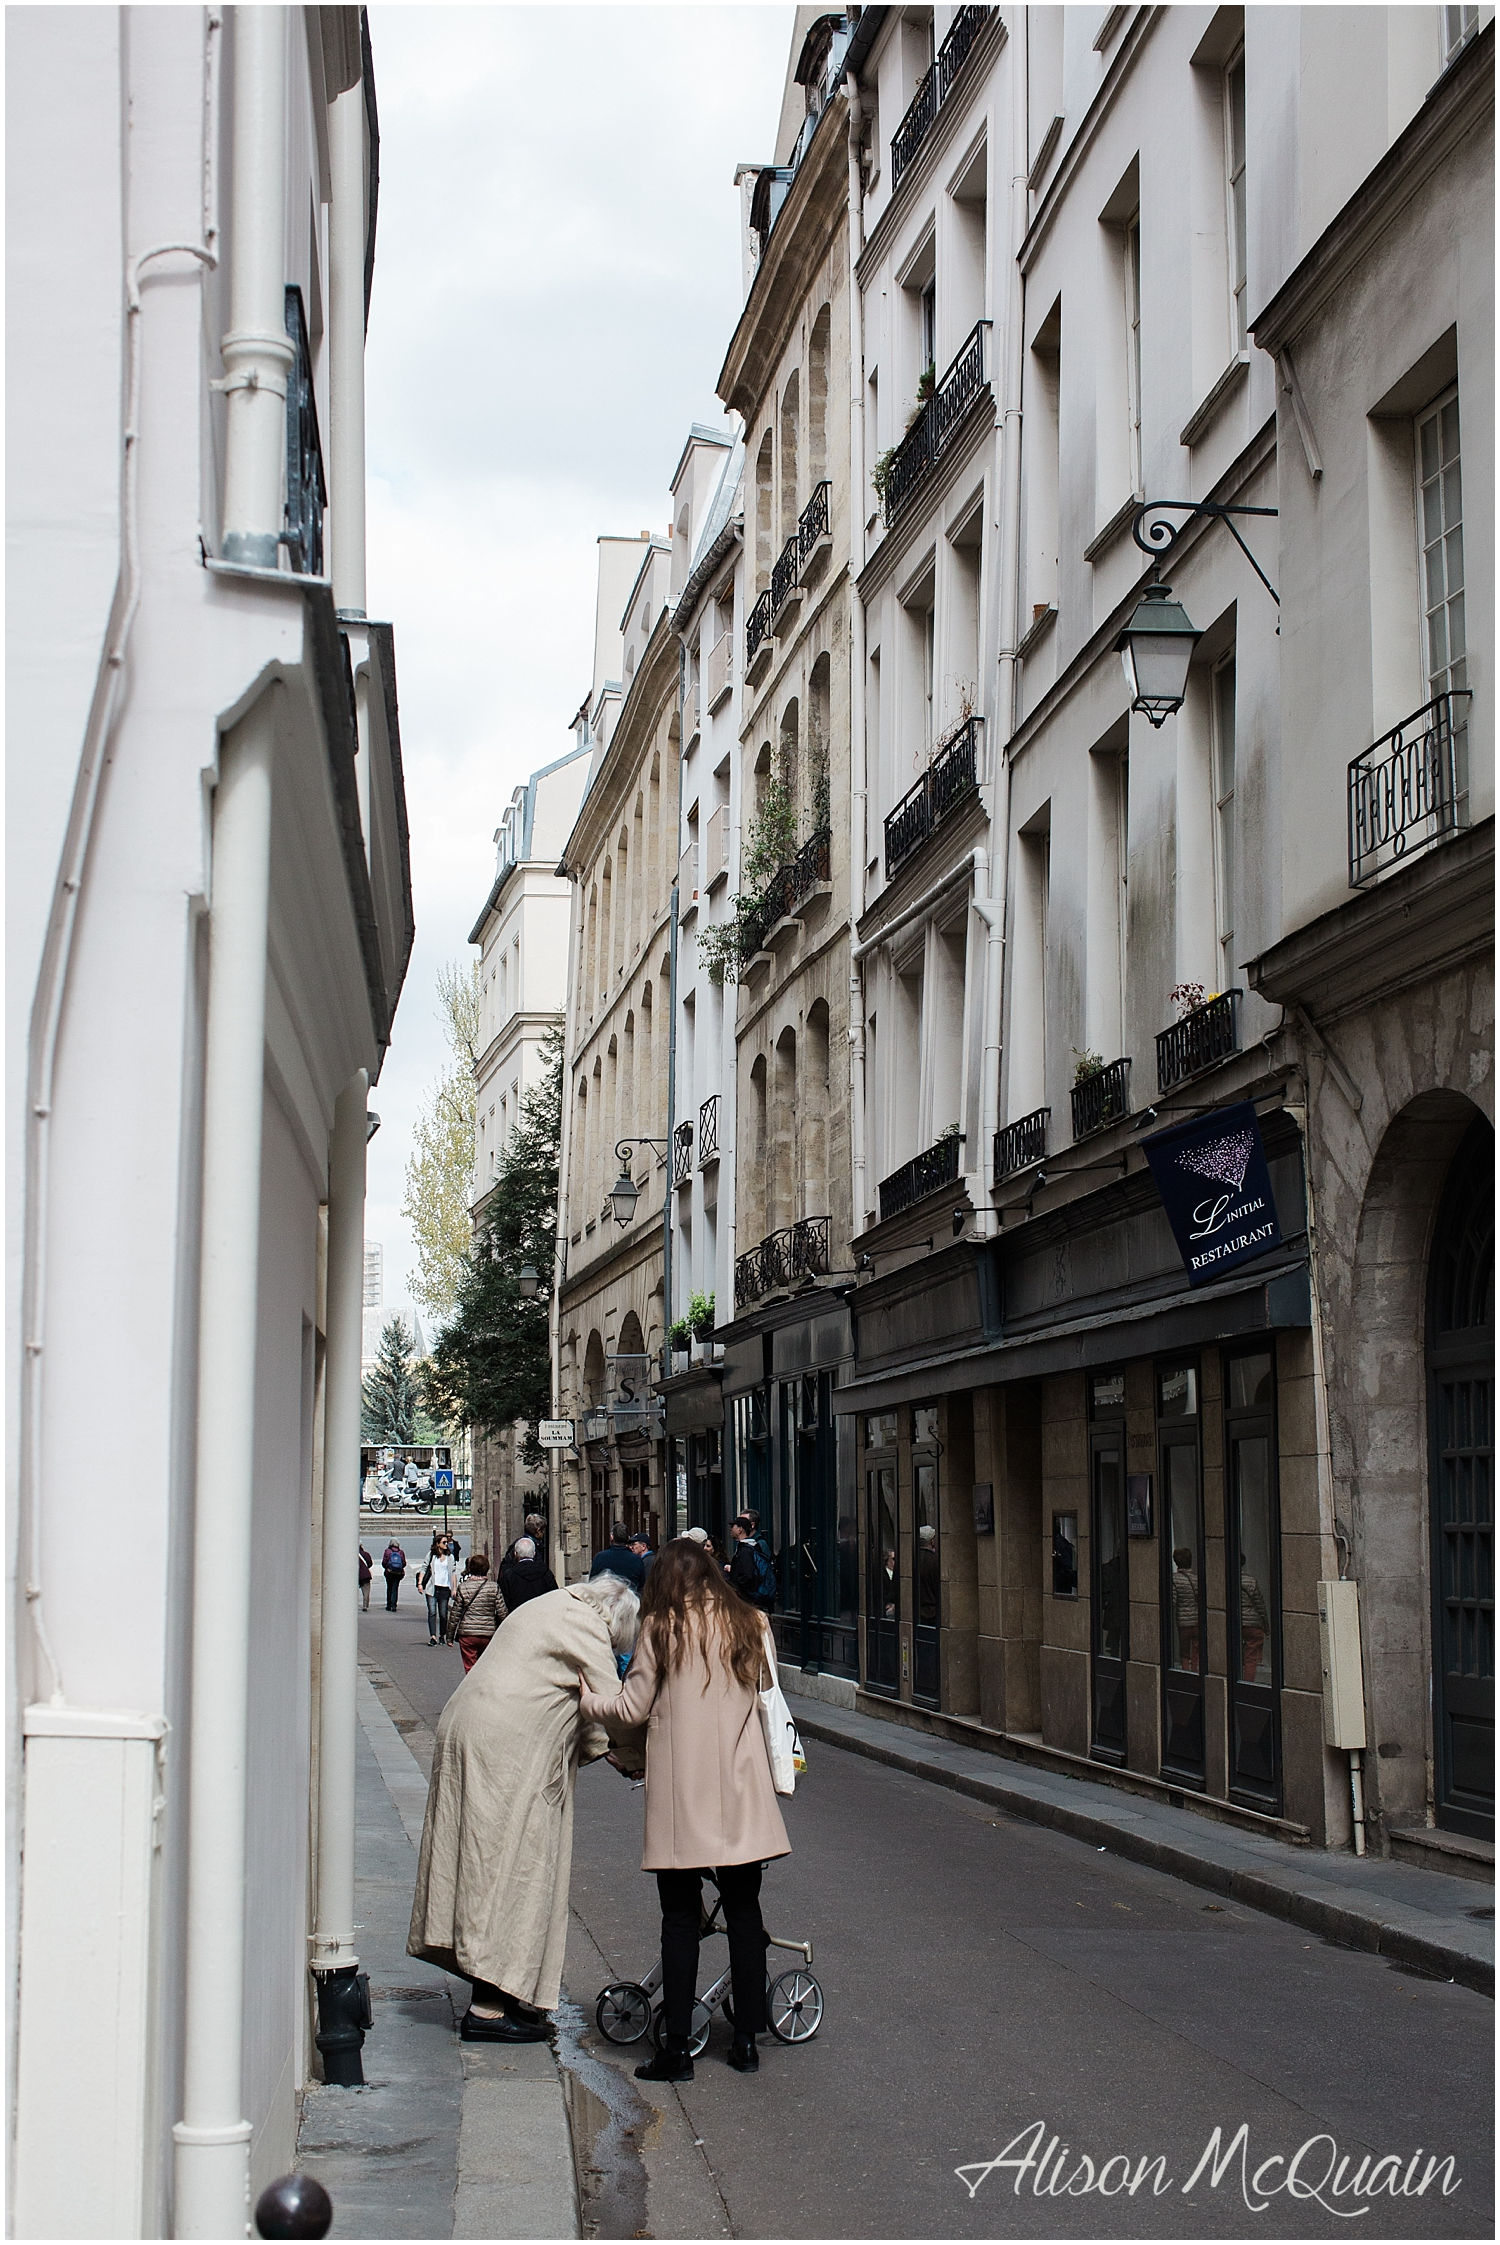 France_Paris_Marseille_Cassis_alisonmcquainphtography2018-04-27_0024.jpg